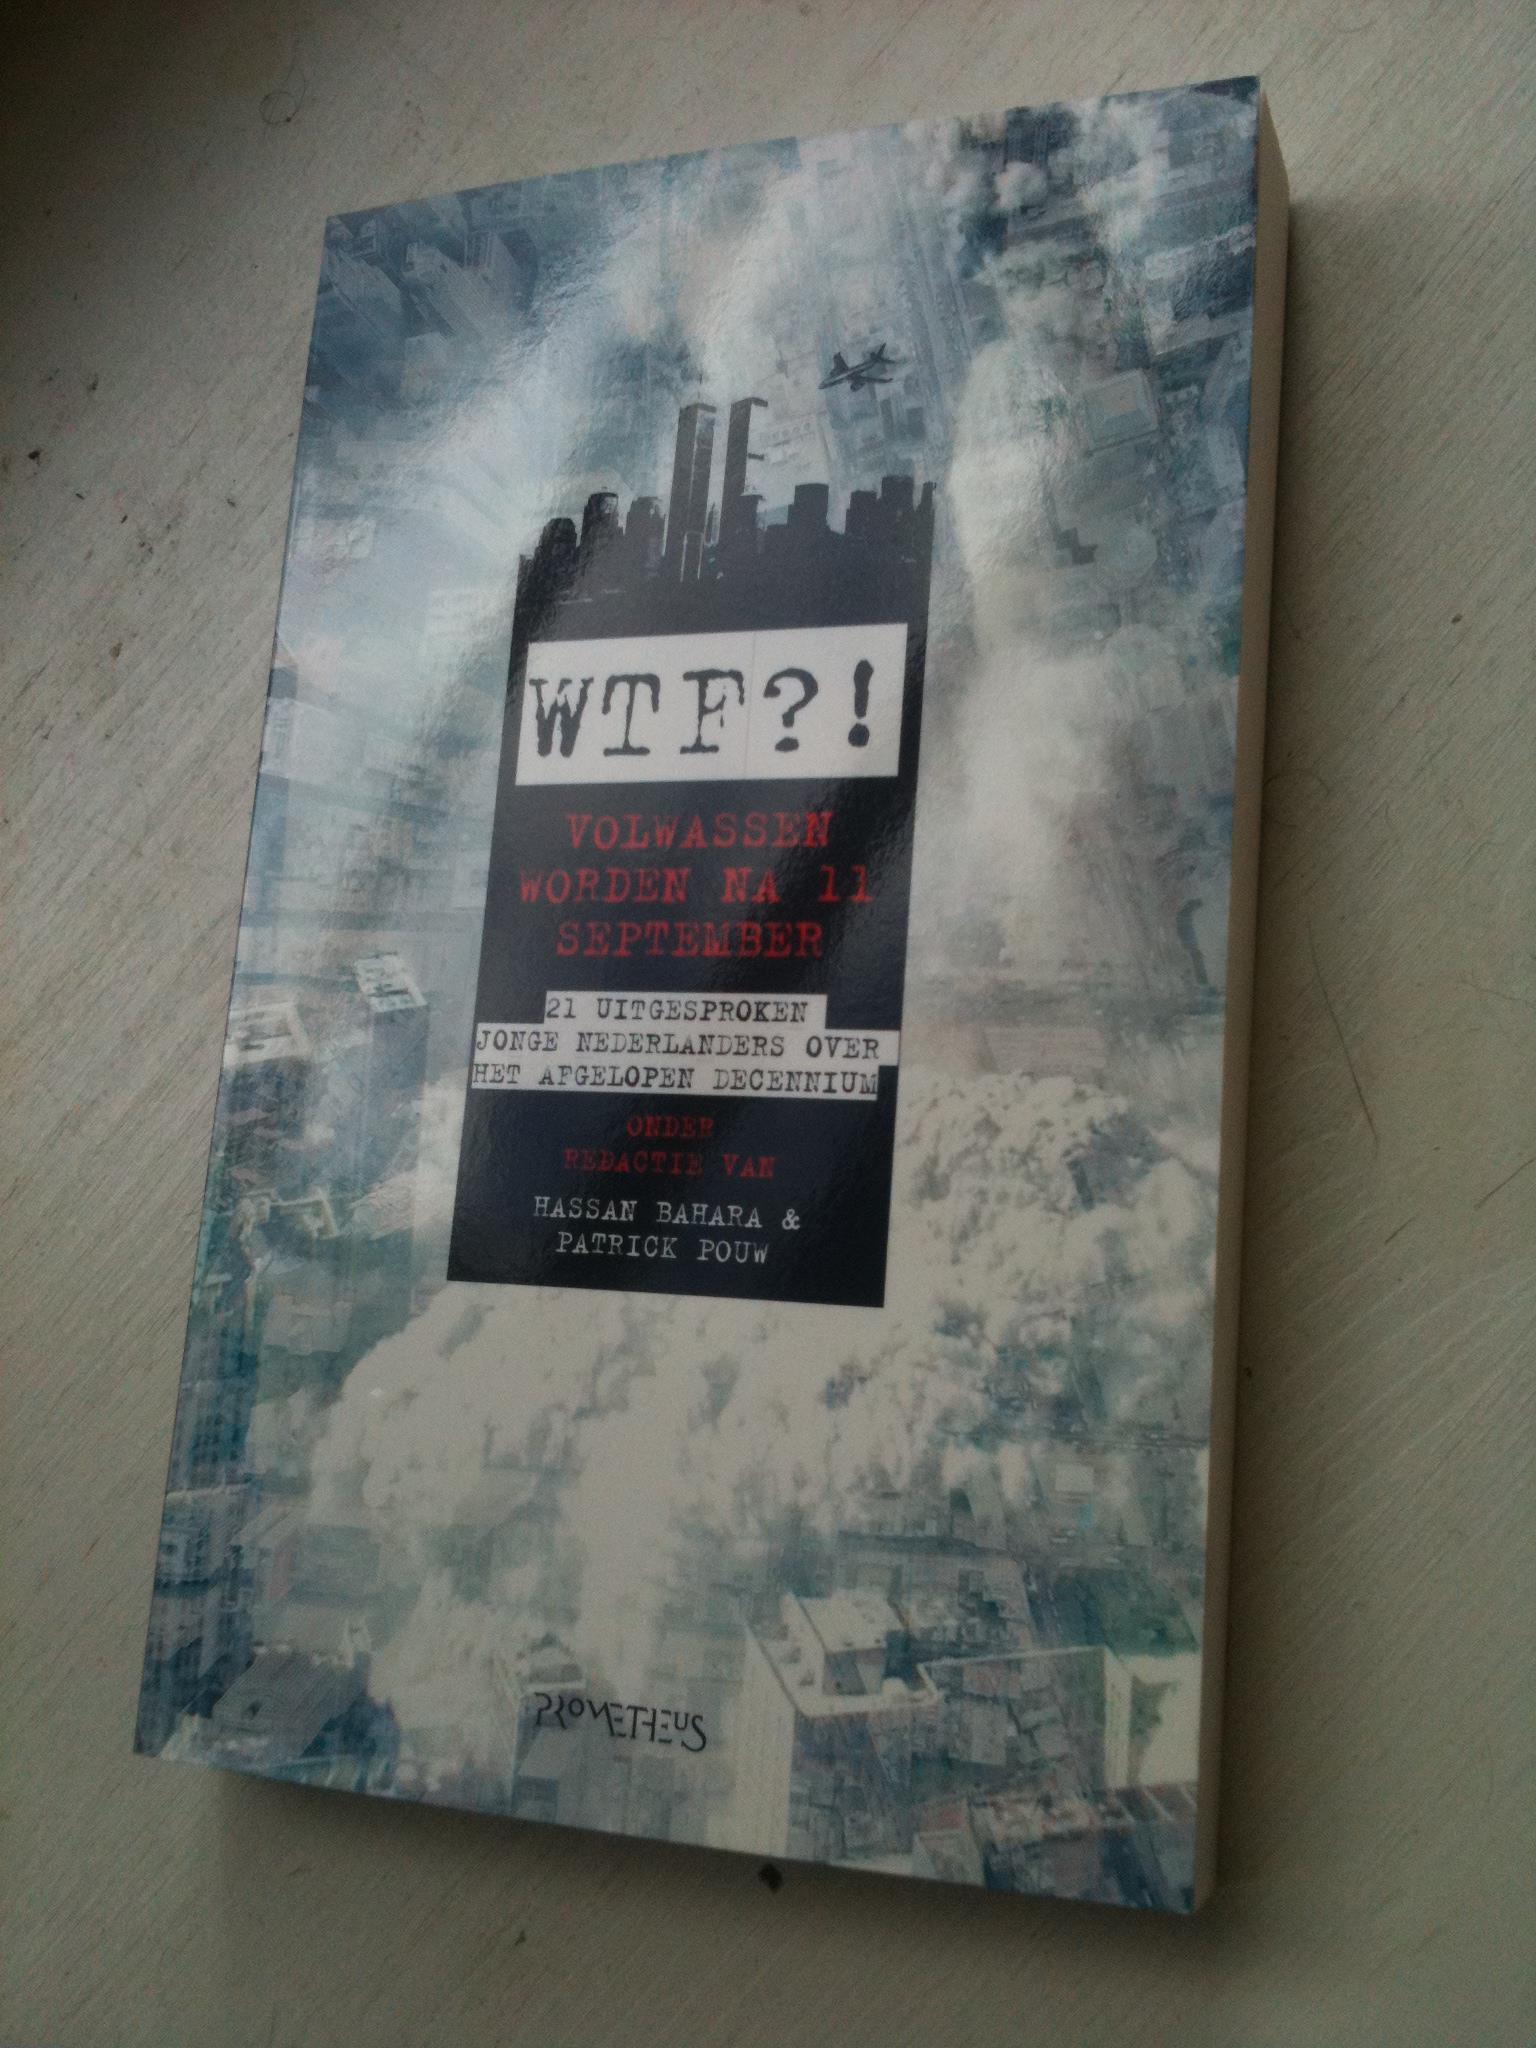 WTF Volwassen worden na 11 september